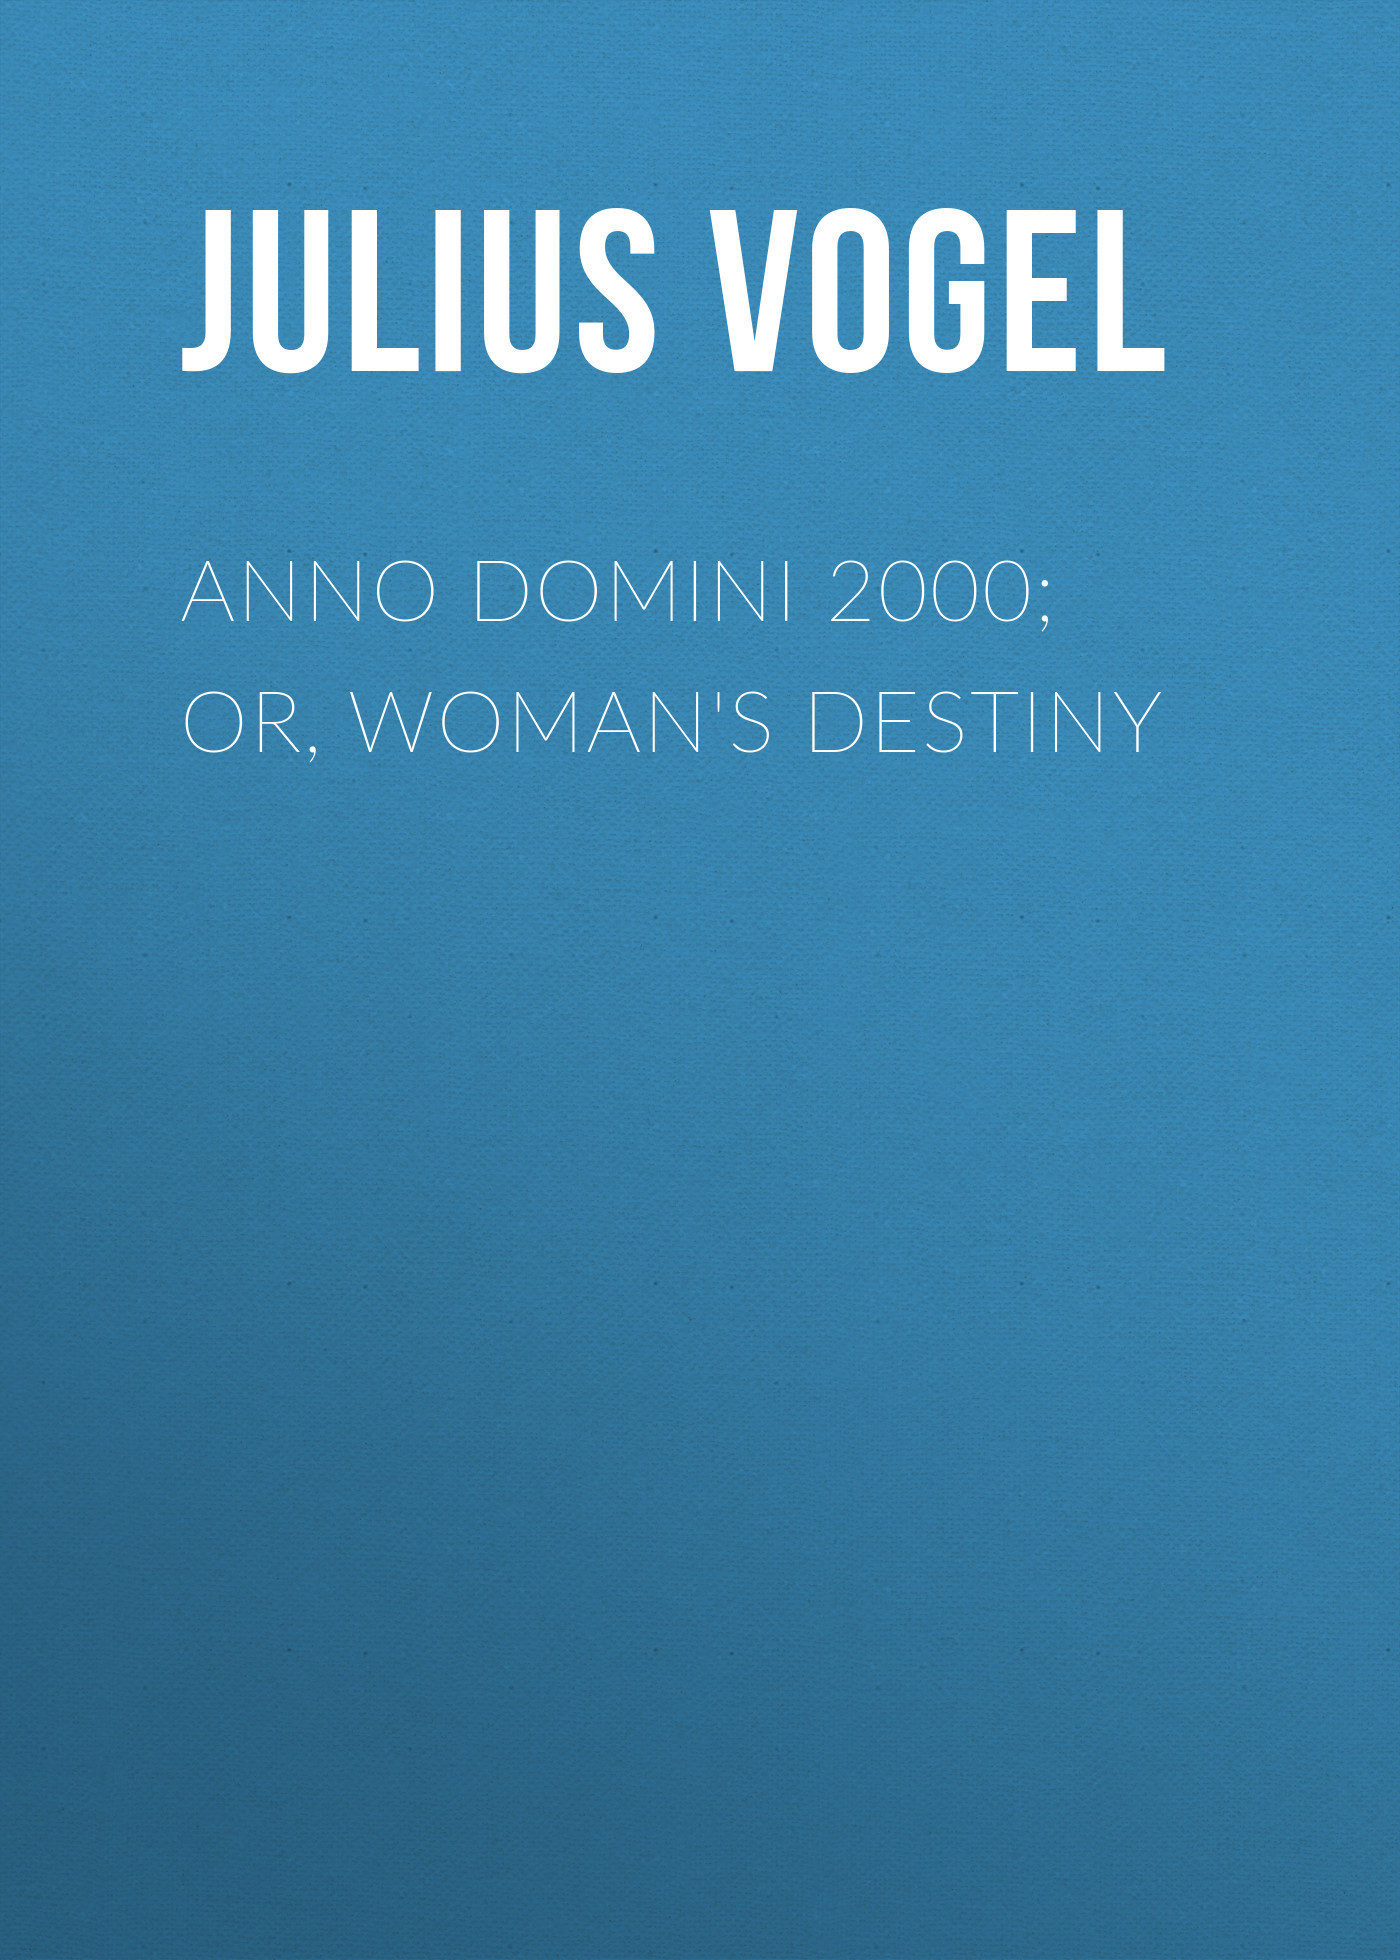 все цены на Julius Vogel Anno Domini 2000; or, Woman's Destiny онлайн